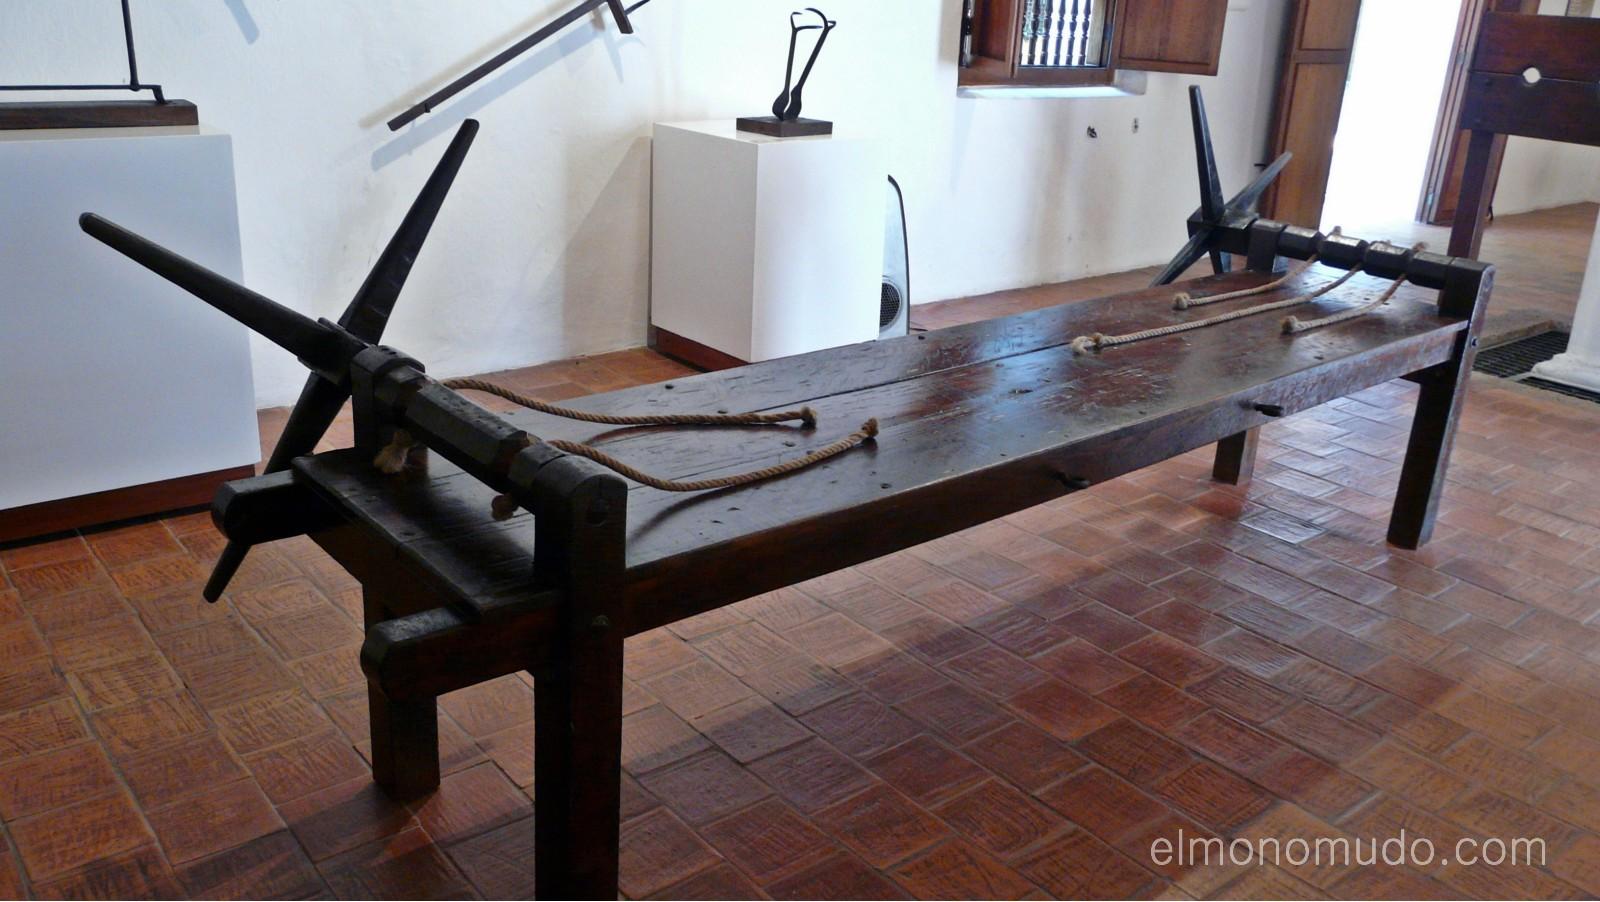 Instrumentos  de tortura reales P1080578-1600x1200